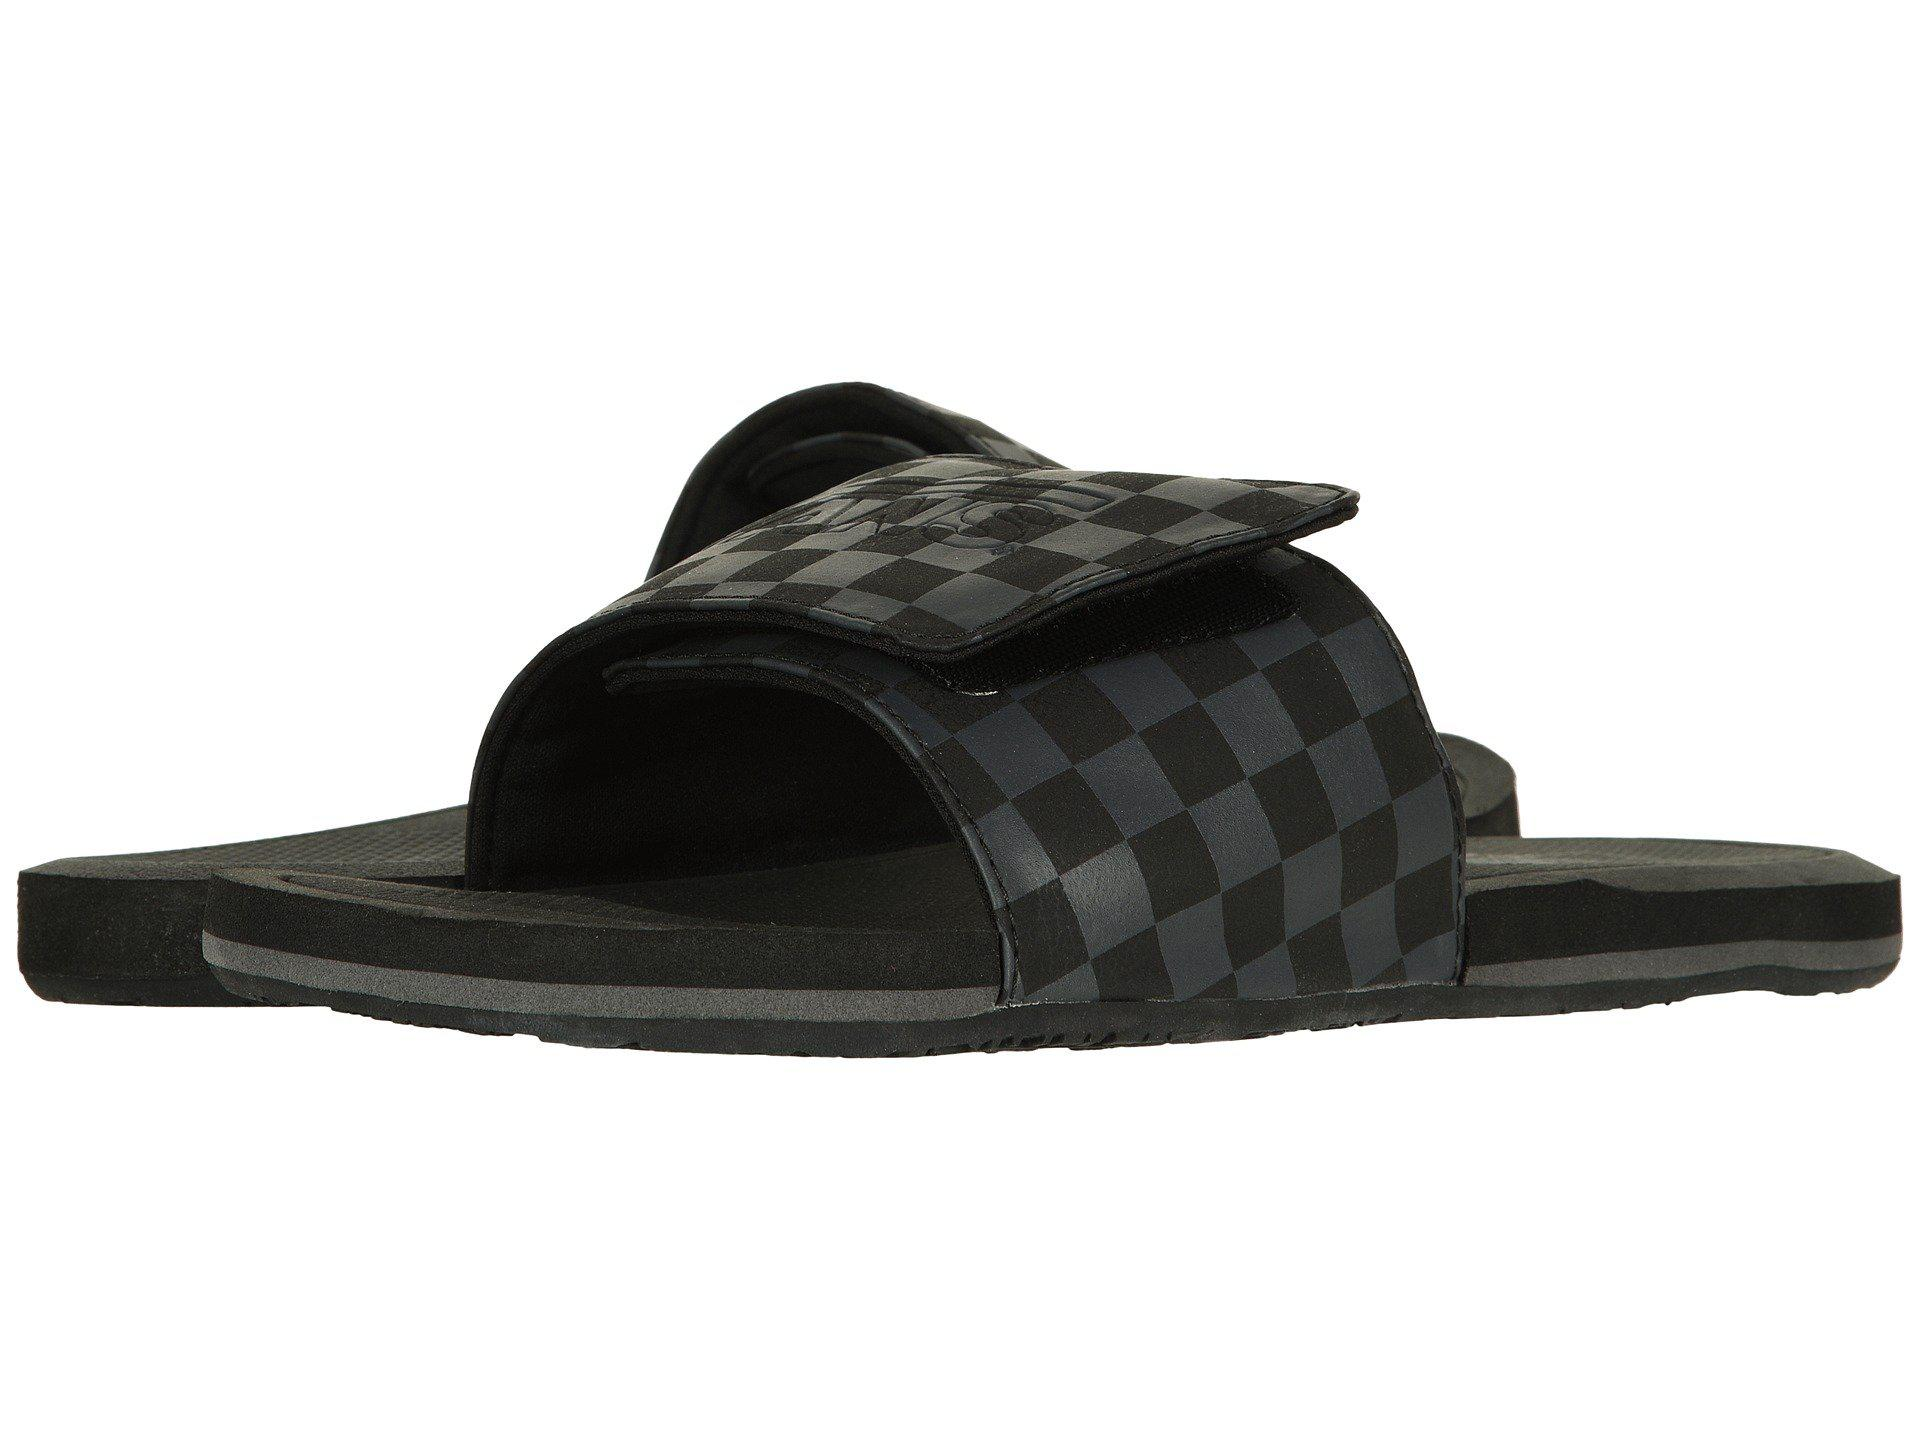 45b83aaf6cd7 Lyst - Vans Nexpa Slide in Black for Men